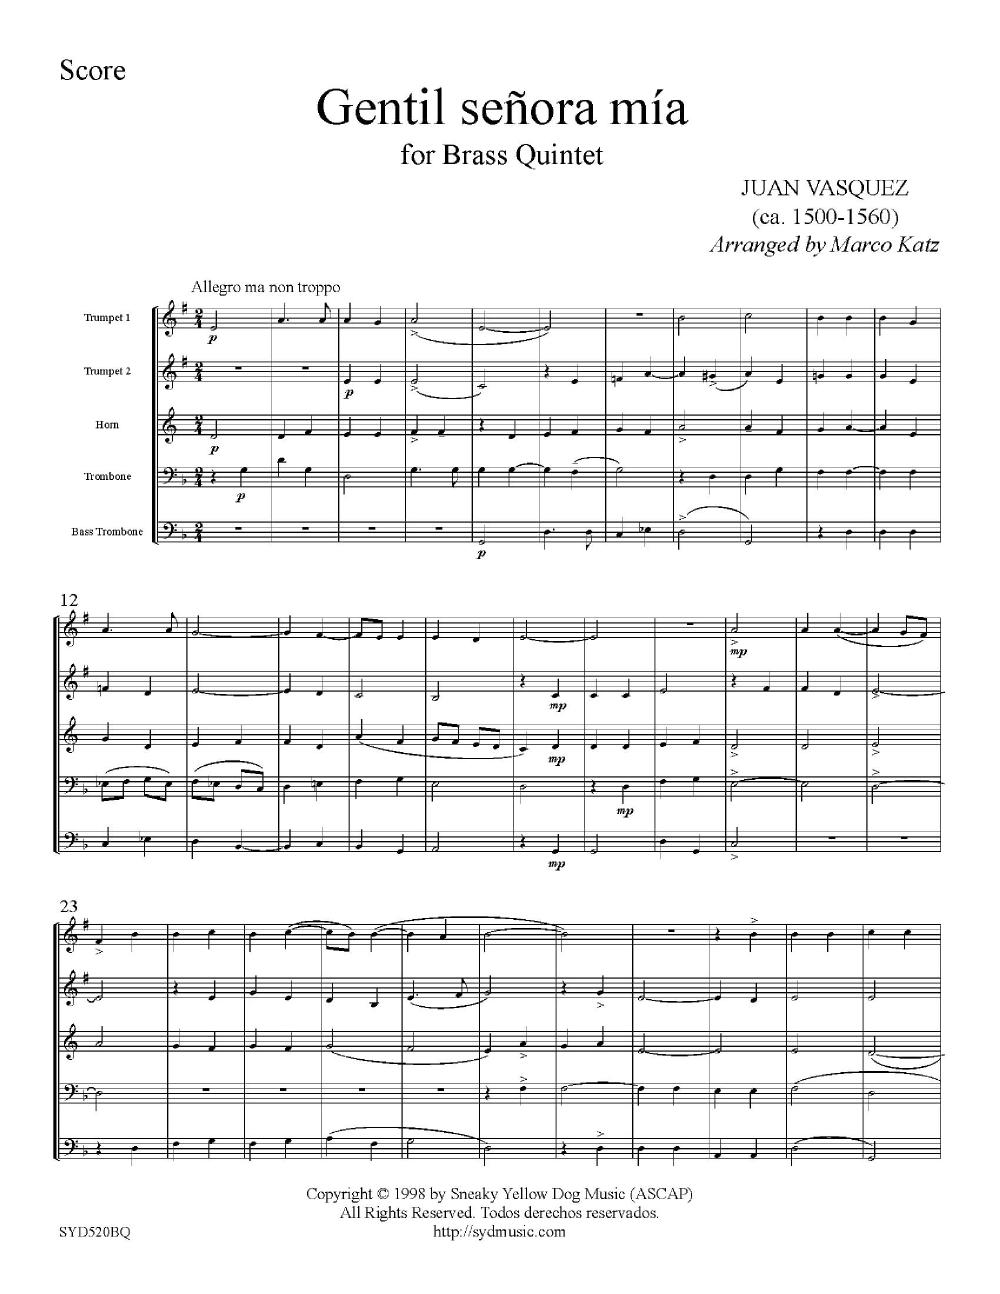 Gentil Senora Mia-Brass Quintet Thumbnail